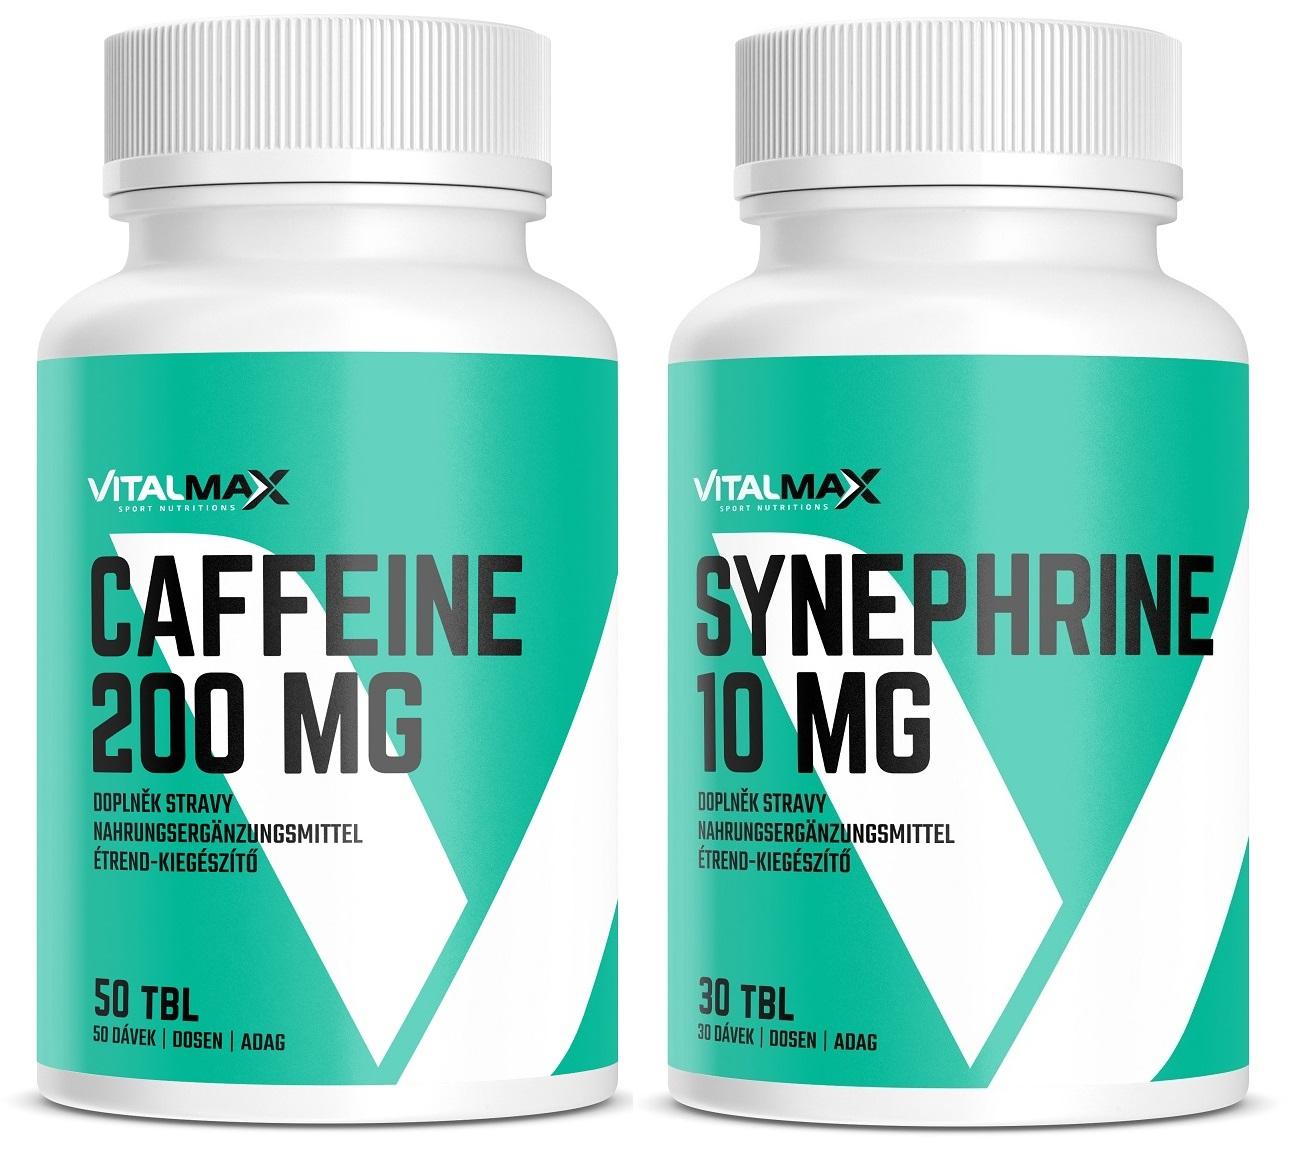 Vitalmax SYNEPHRINE + CAFFEINE  440f9840f603e